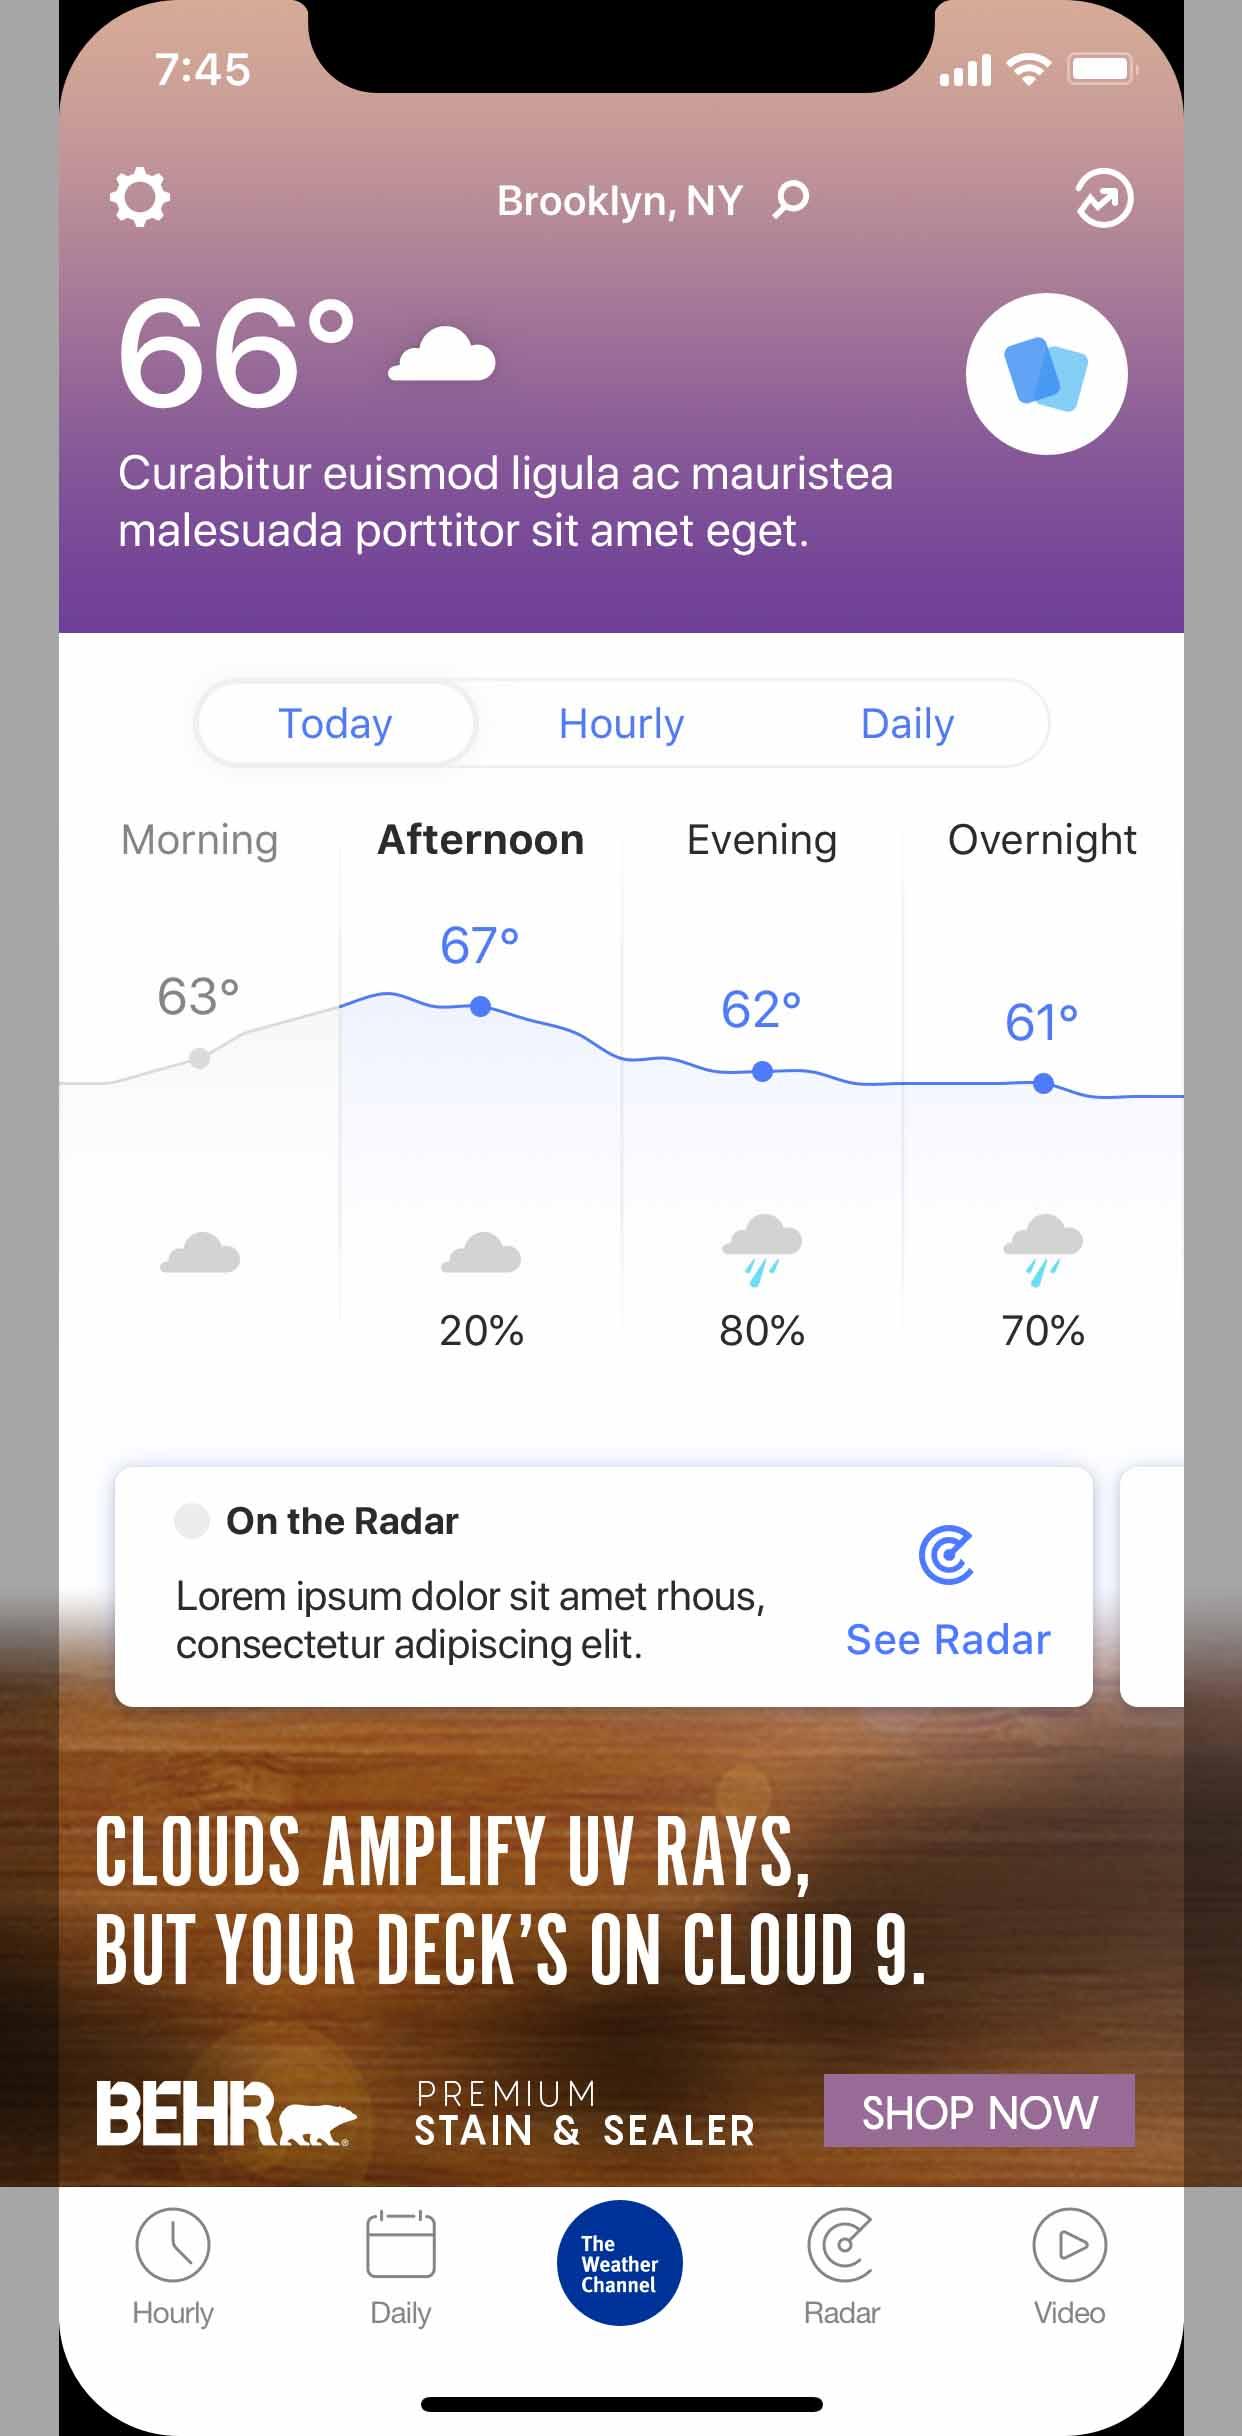 behr__day_cloudy-lrg